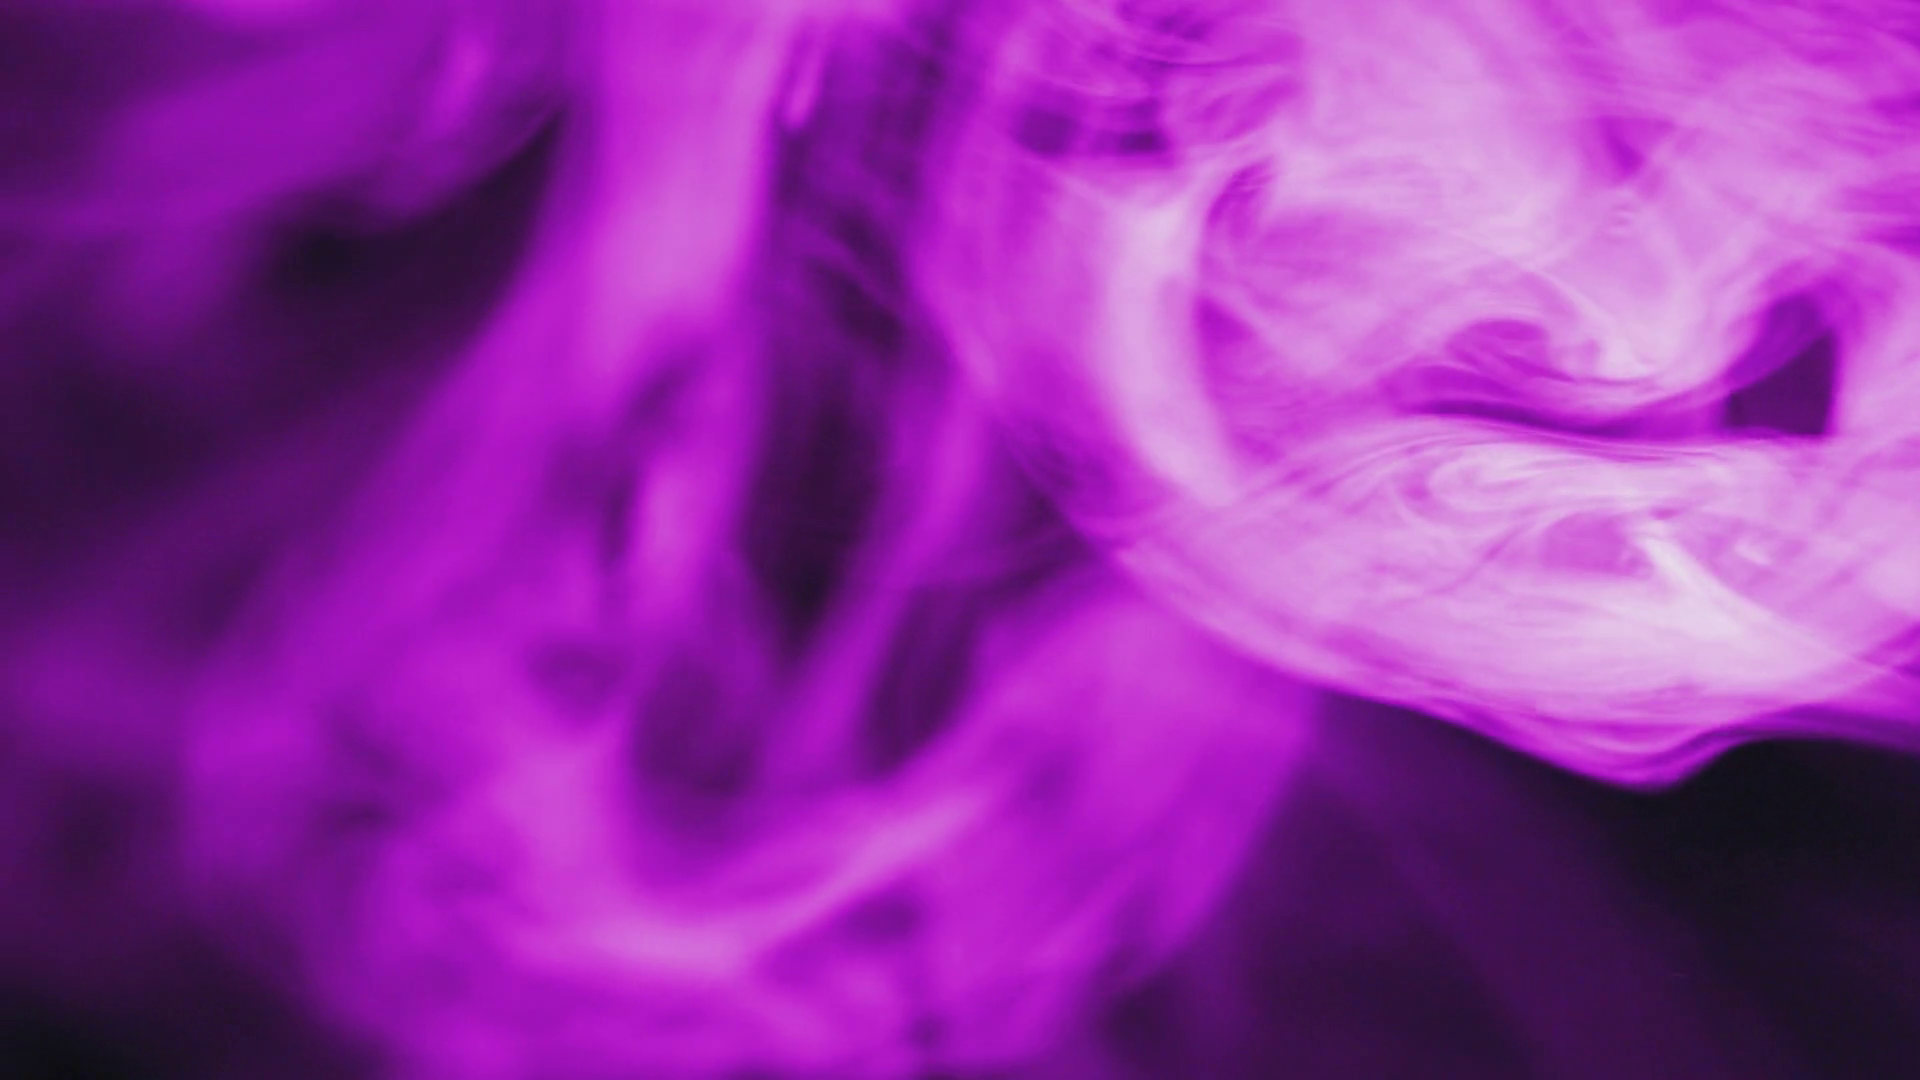 Фото чувака в пурпурном шлеме с йогуртом господь